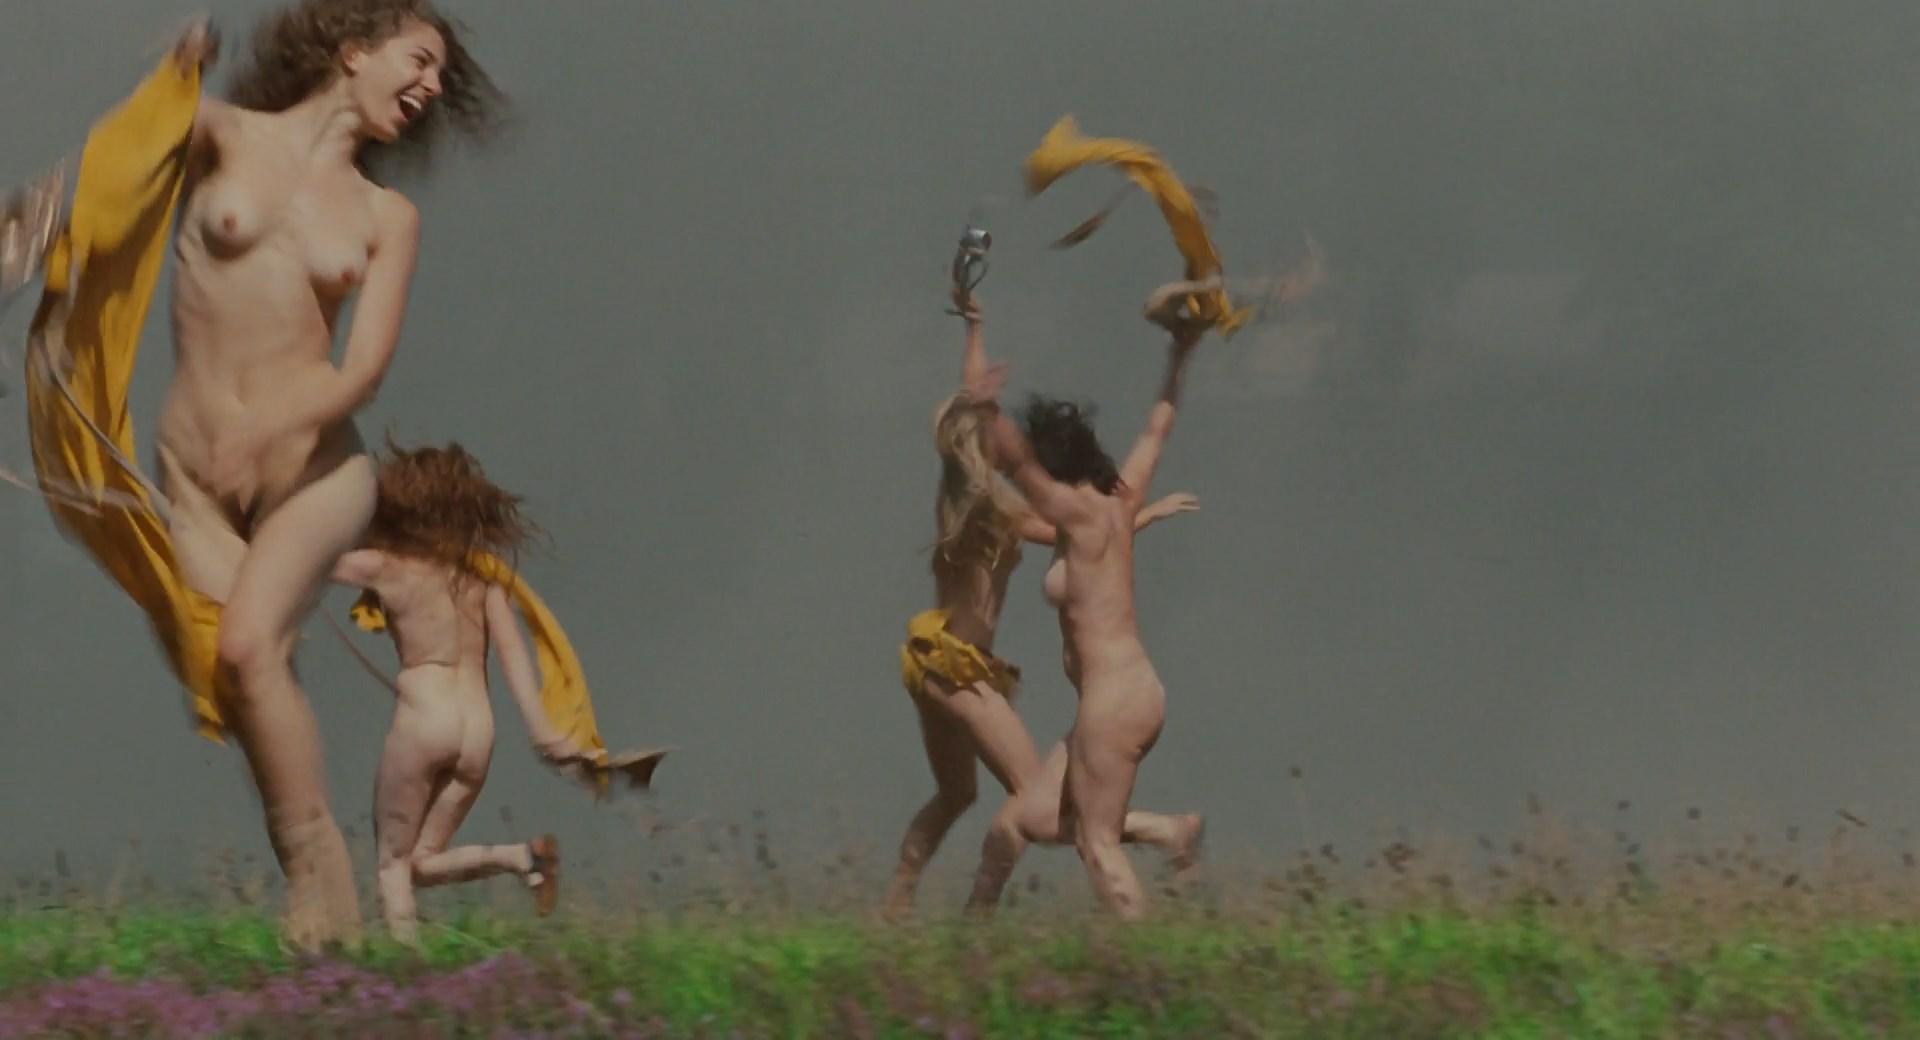 Warm Kelli Garner Nude Pictures Pic